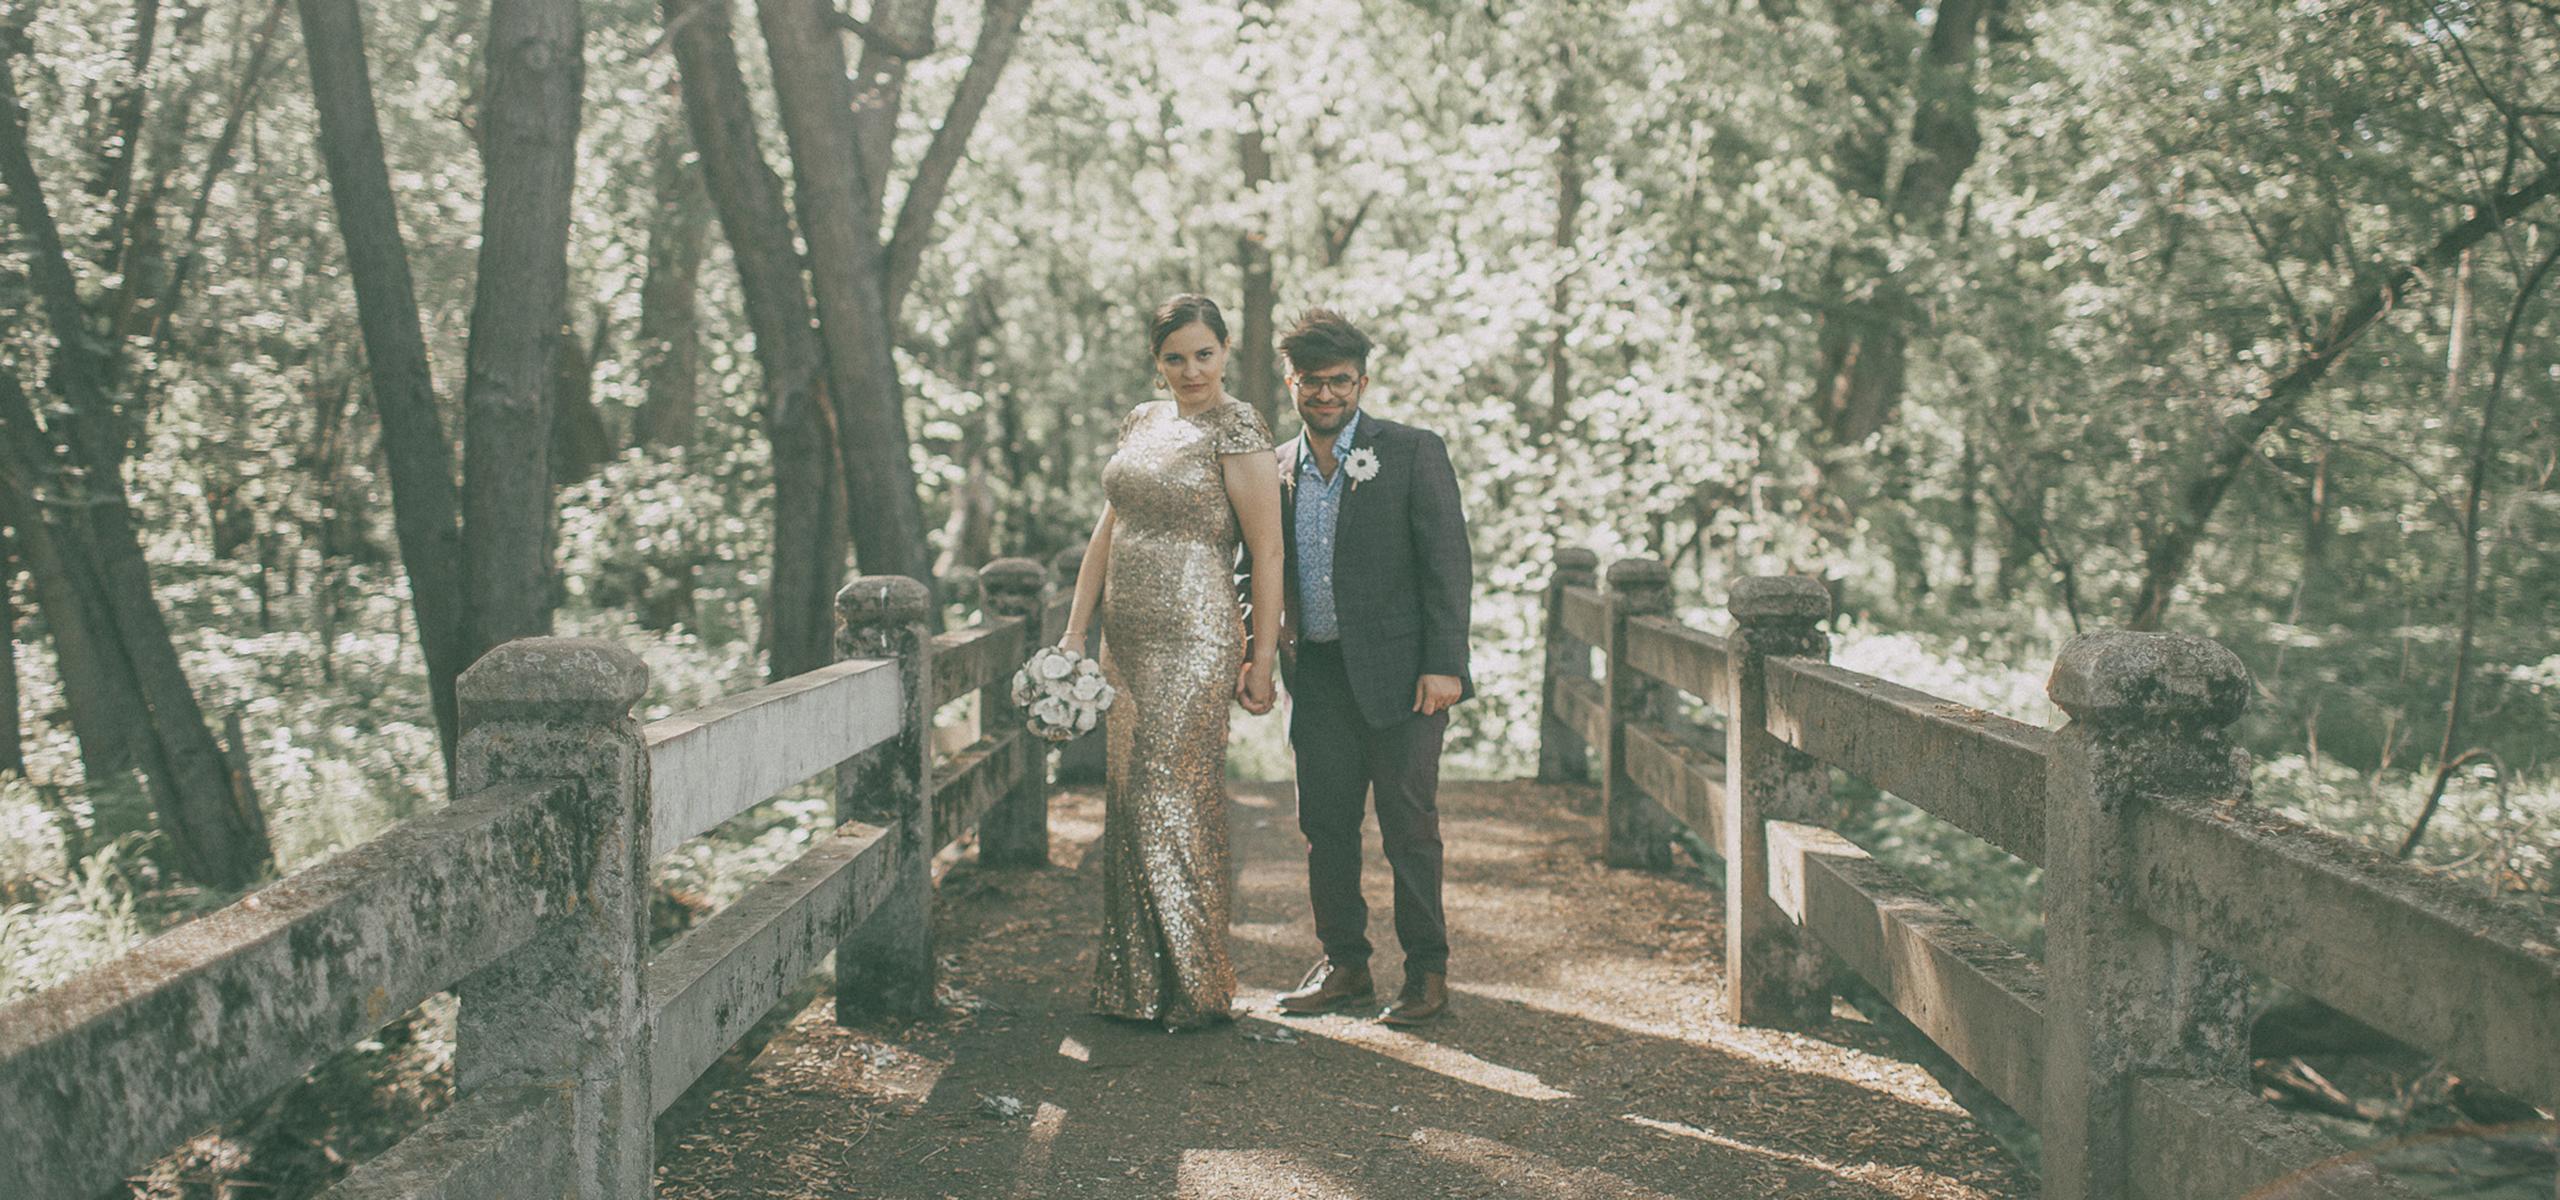 Jacksonville Florida Wedding Photography + Elopement Photography